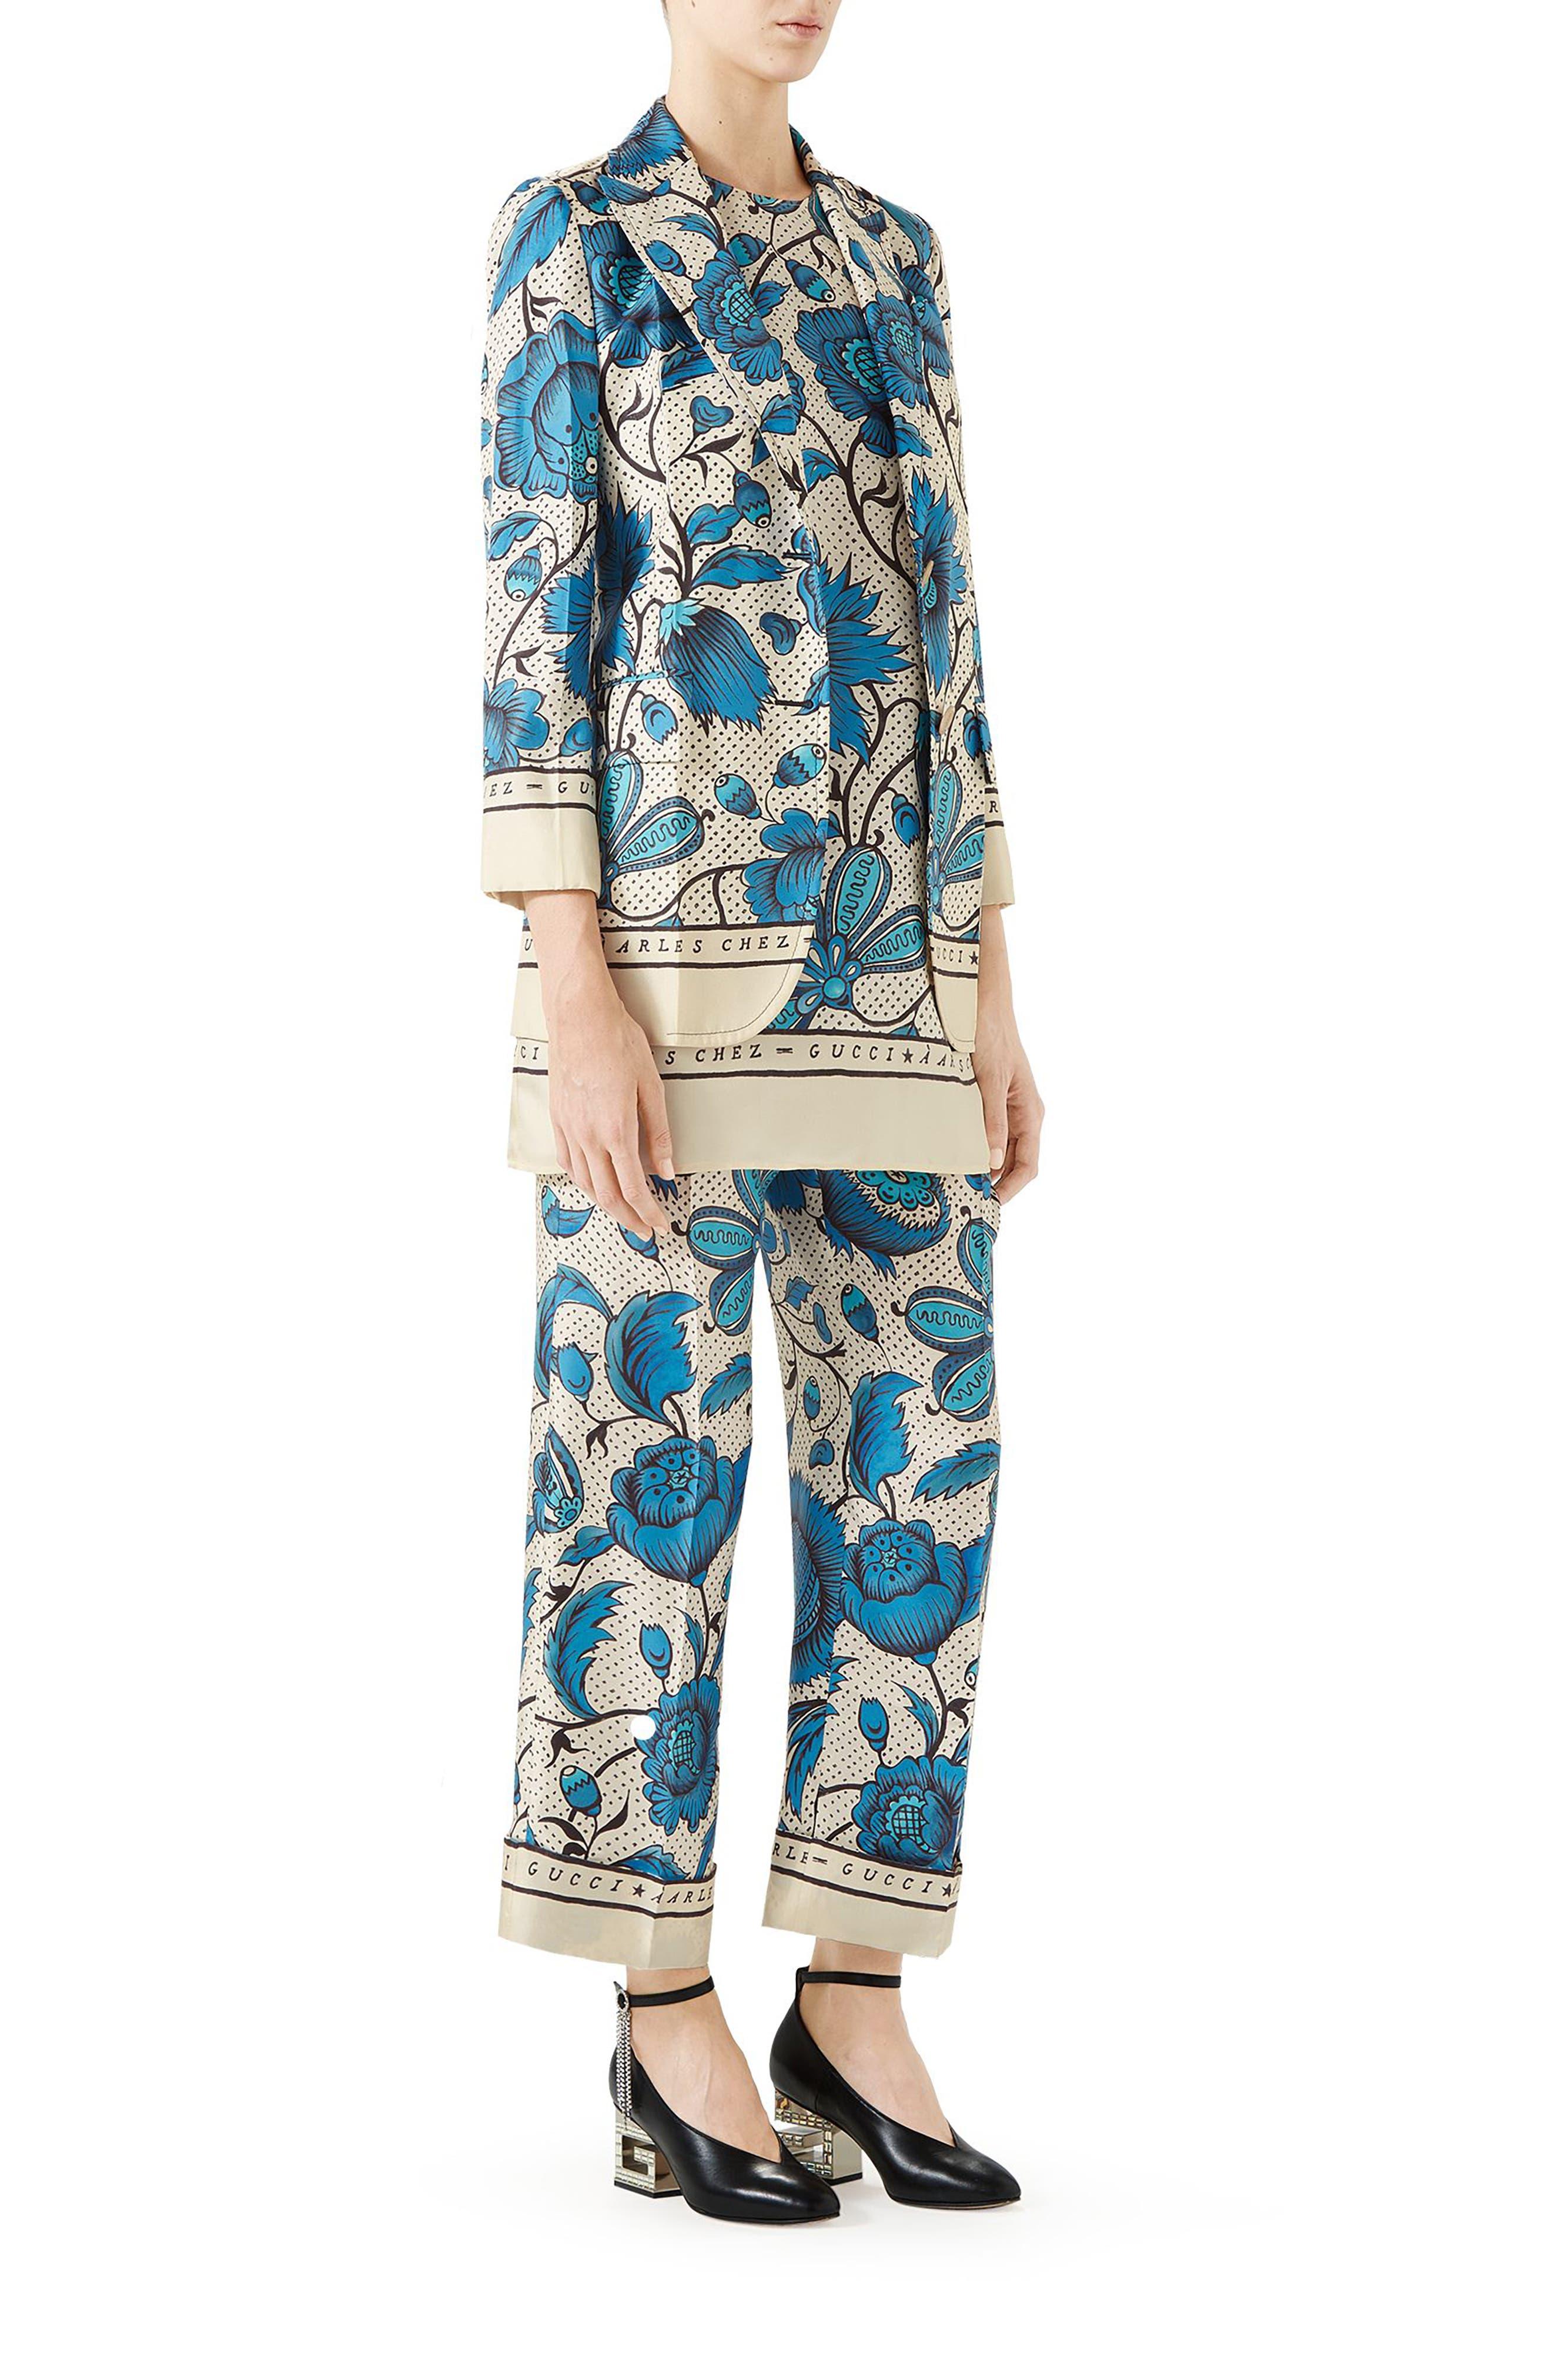 Watercolor Floral Print Silk Jacket,                             Alternate thumbnail 4, color,                             4821 BLUE/ IVORY PRT/ MC